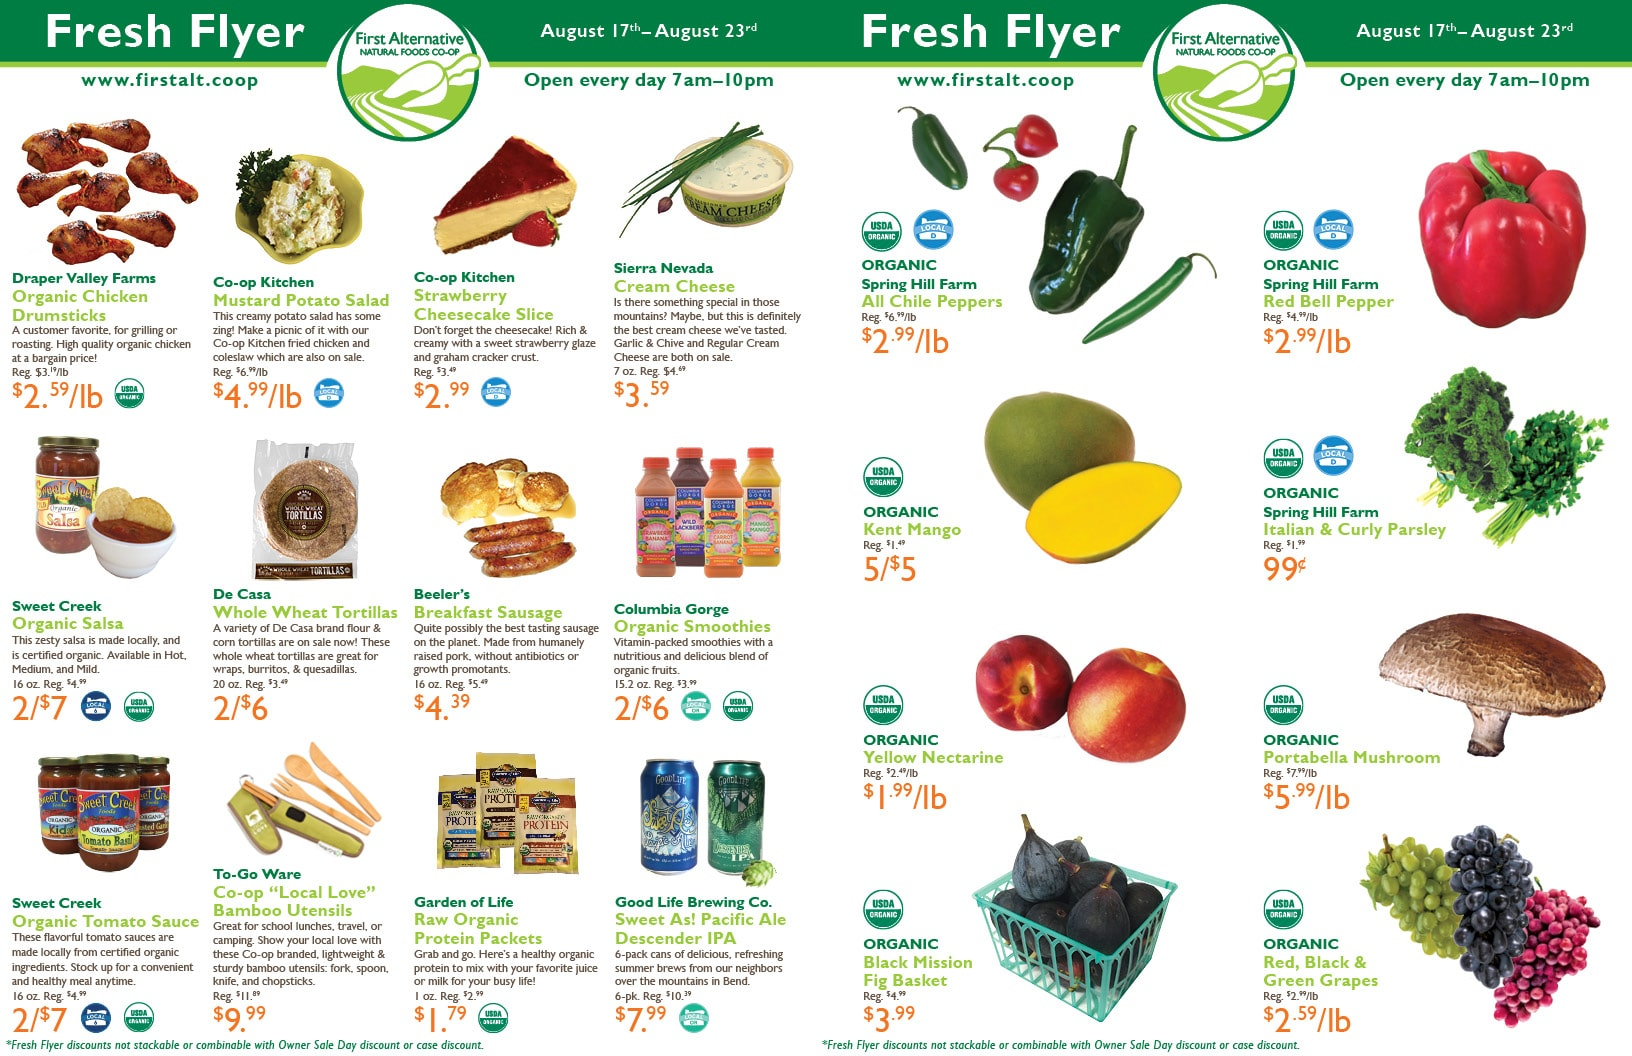 First Alternative Fresh Flyer Aug 17-23